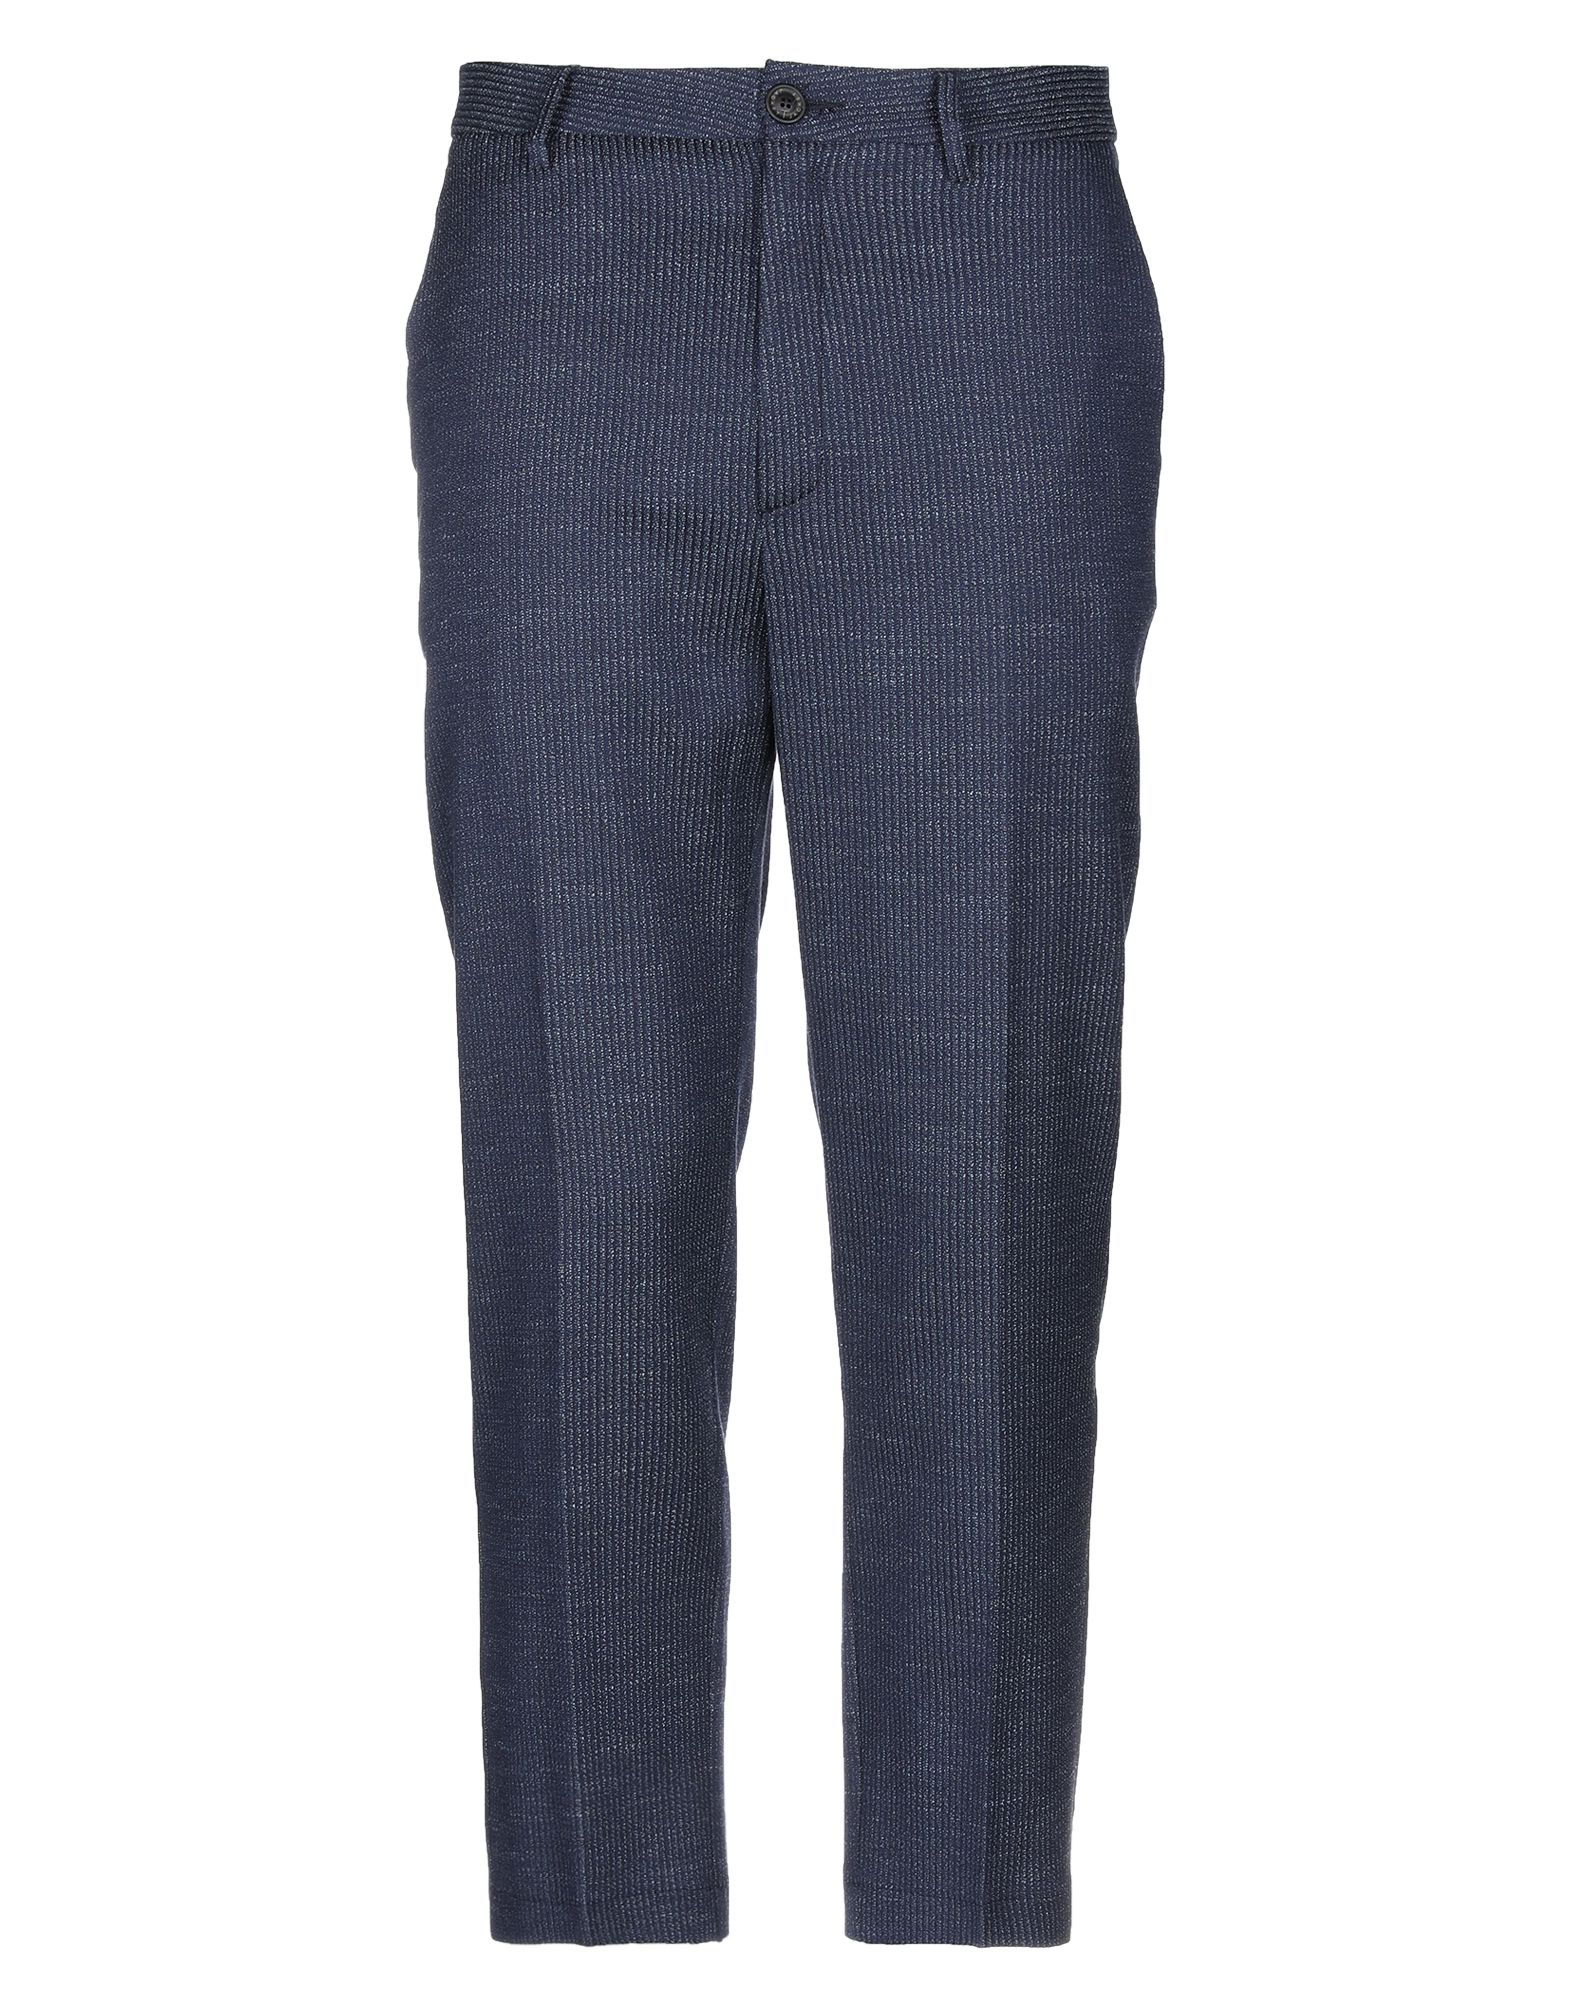 T-JACKET by TONELLO Повседневные брюки jackets modis m182s00041 down coat jacket for female for woman tmallfs